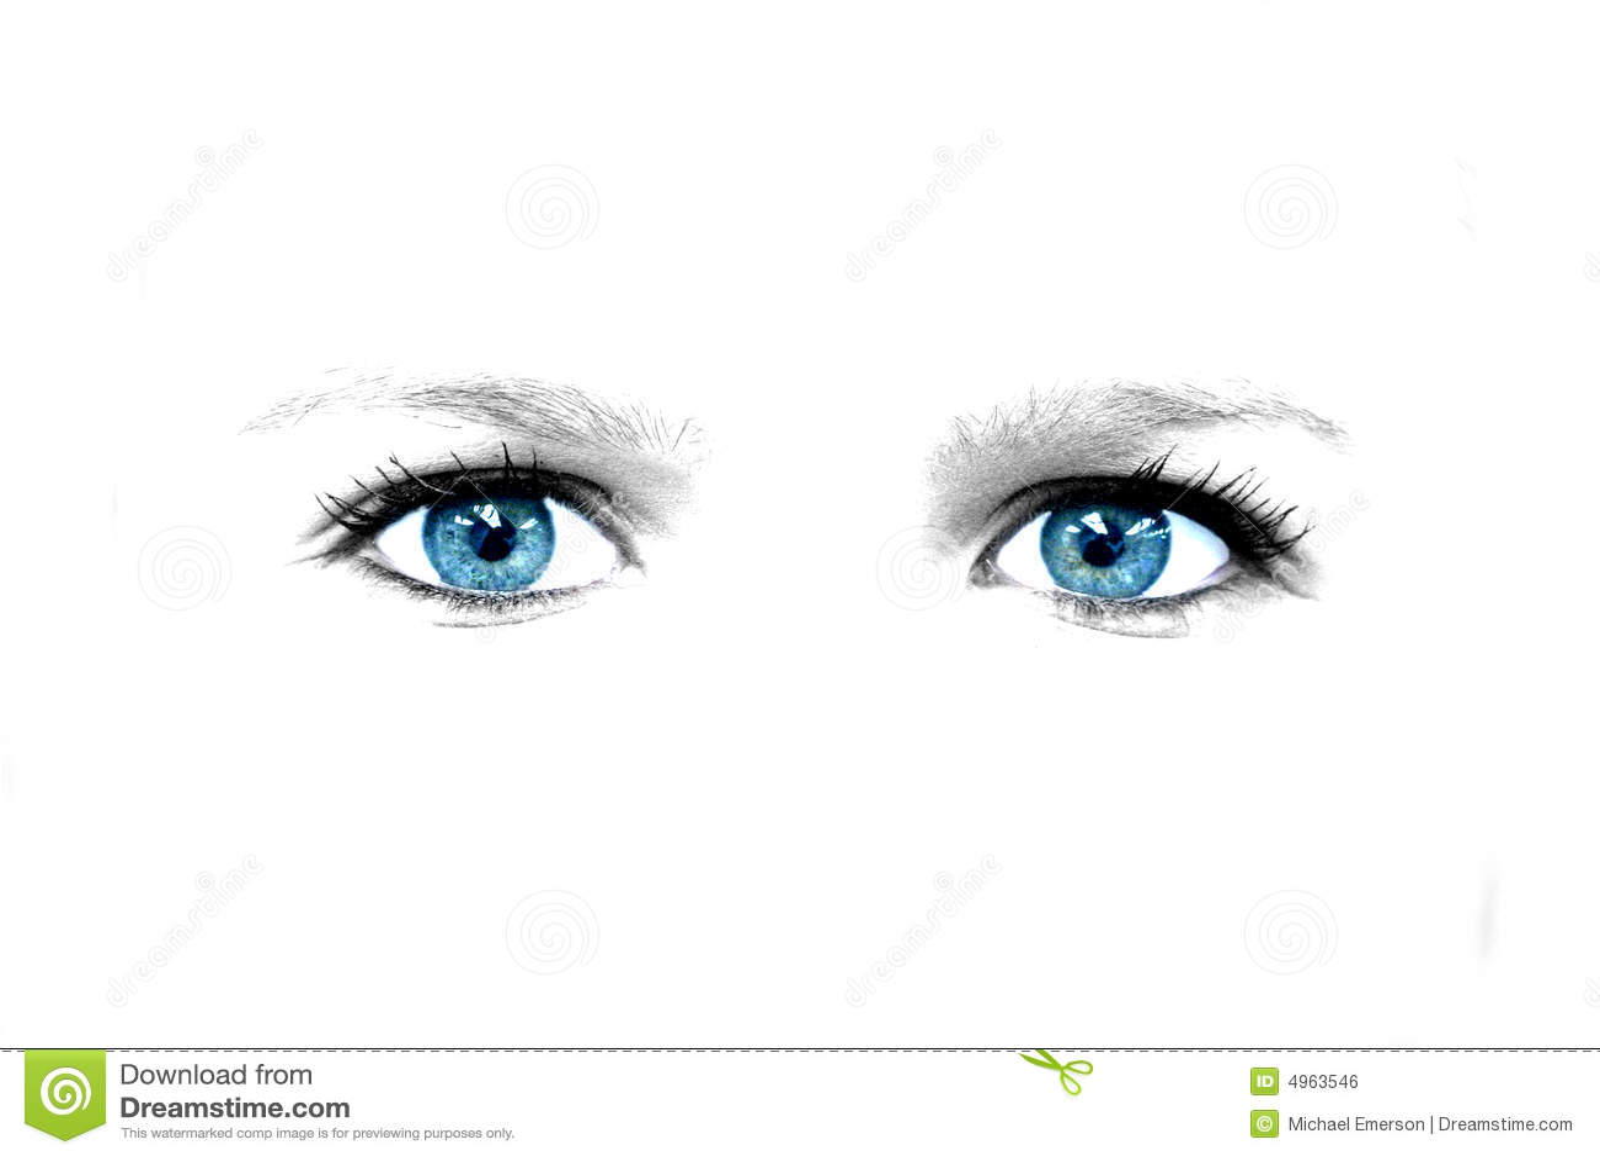 Abrégé sur œil bleu